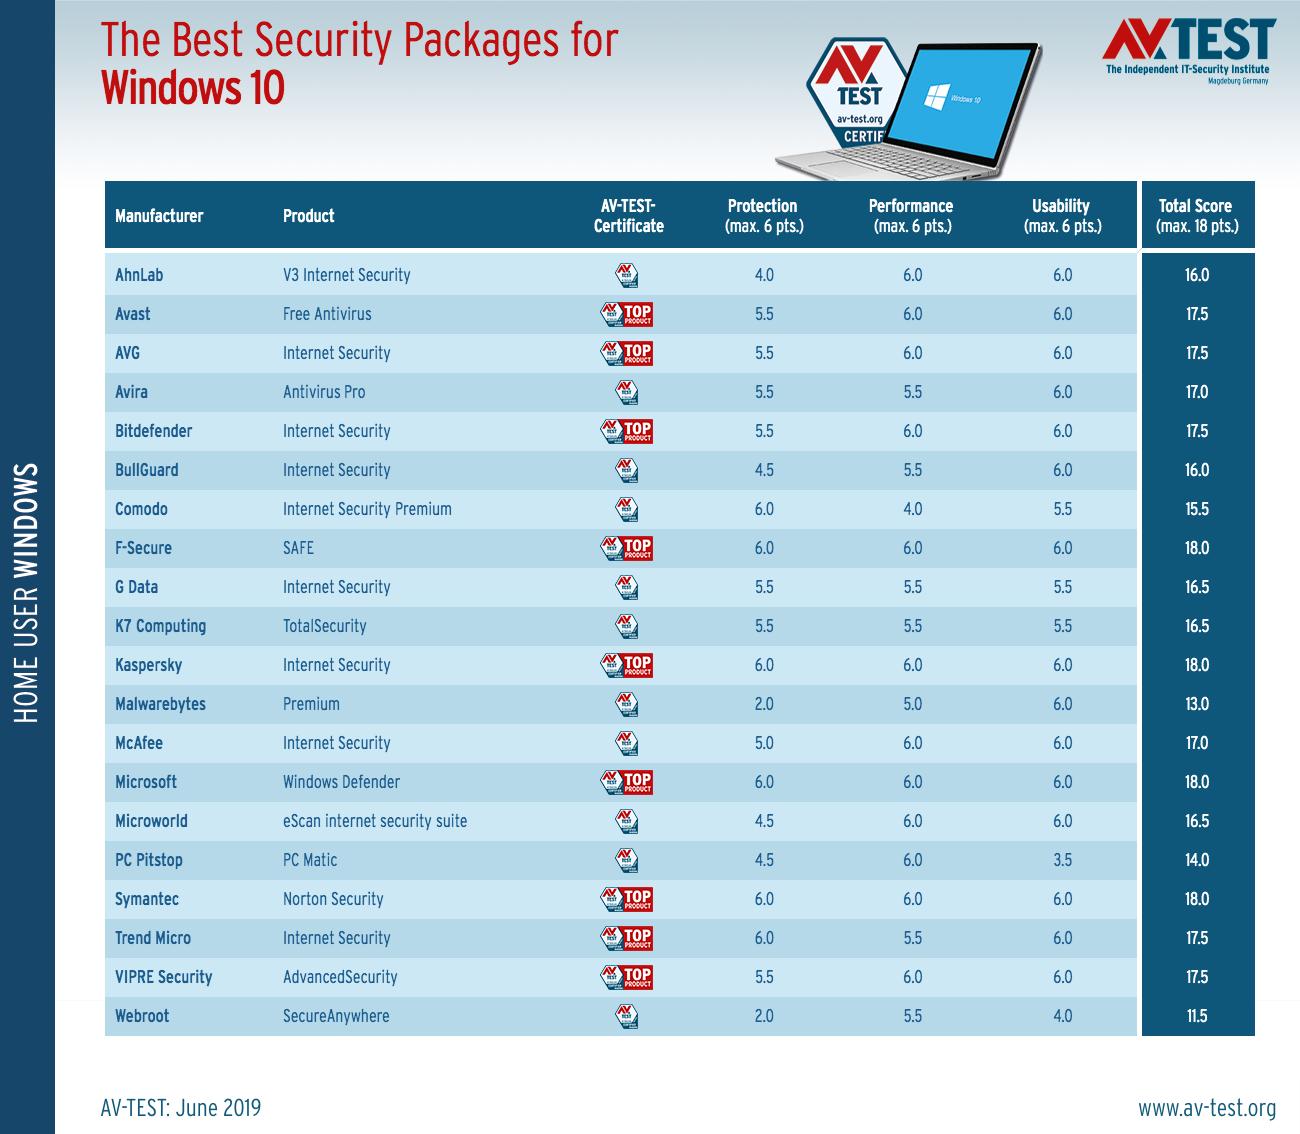 To Windows Defender της Microsoft είναι πλέον μια από τις καλύτερες εφαρμογές antivirus στον κόσμο Micros14